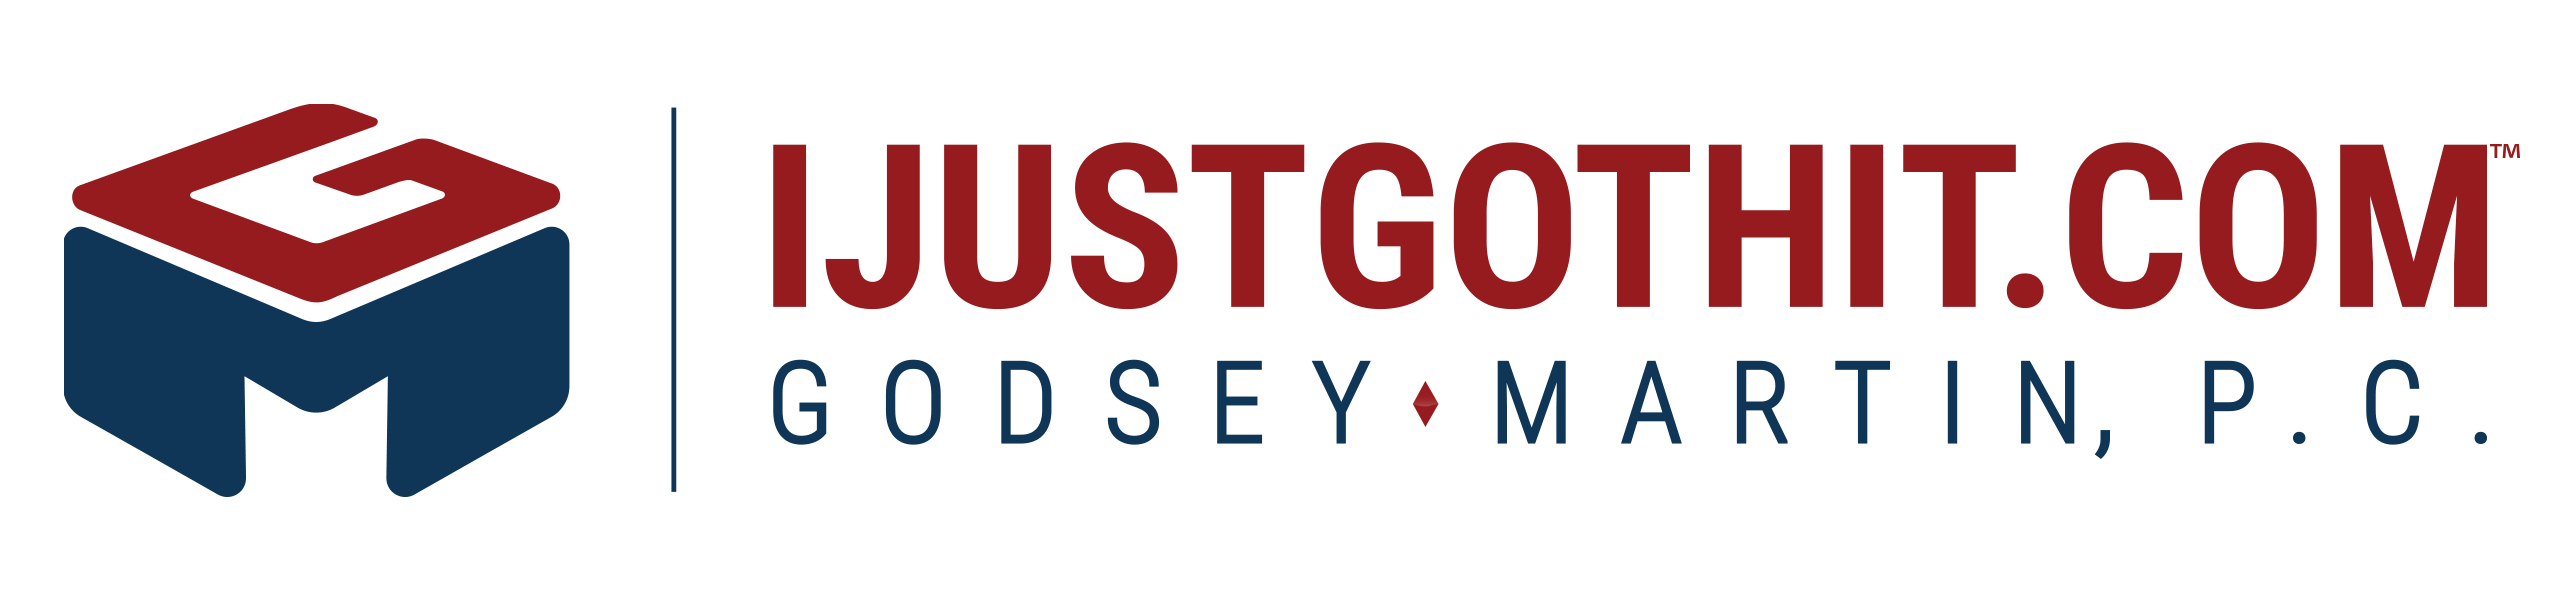 Godsey Martin, P.C. reviews | Personal Injury Law at 2950 N Loop West - Houston TX